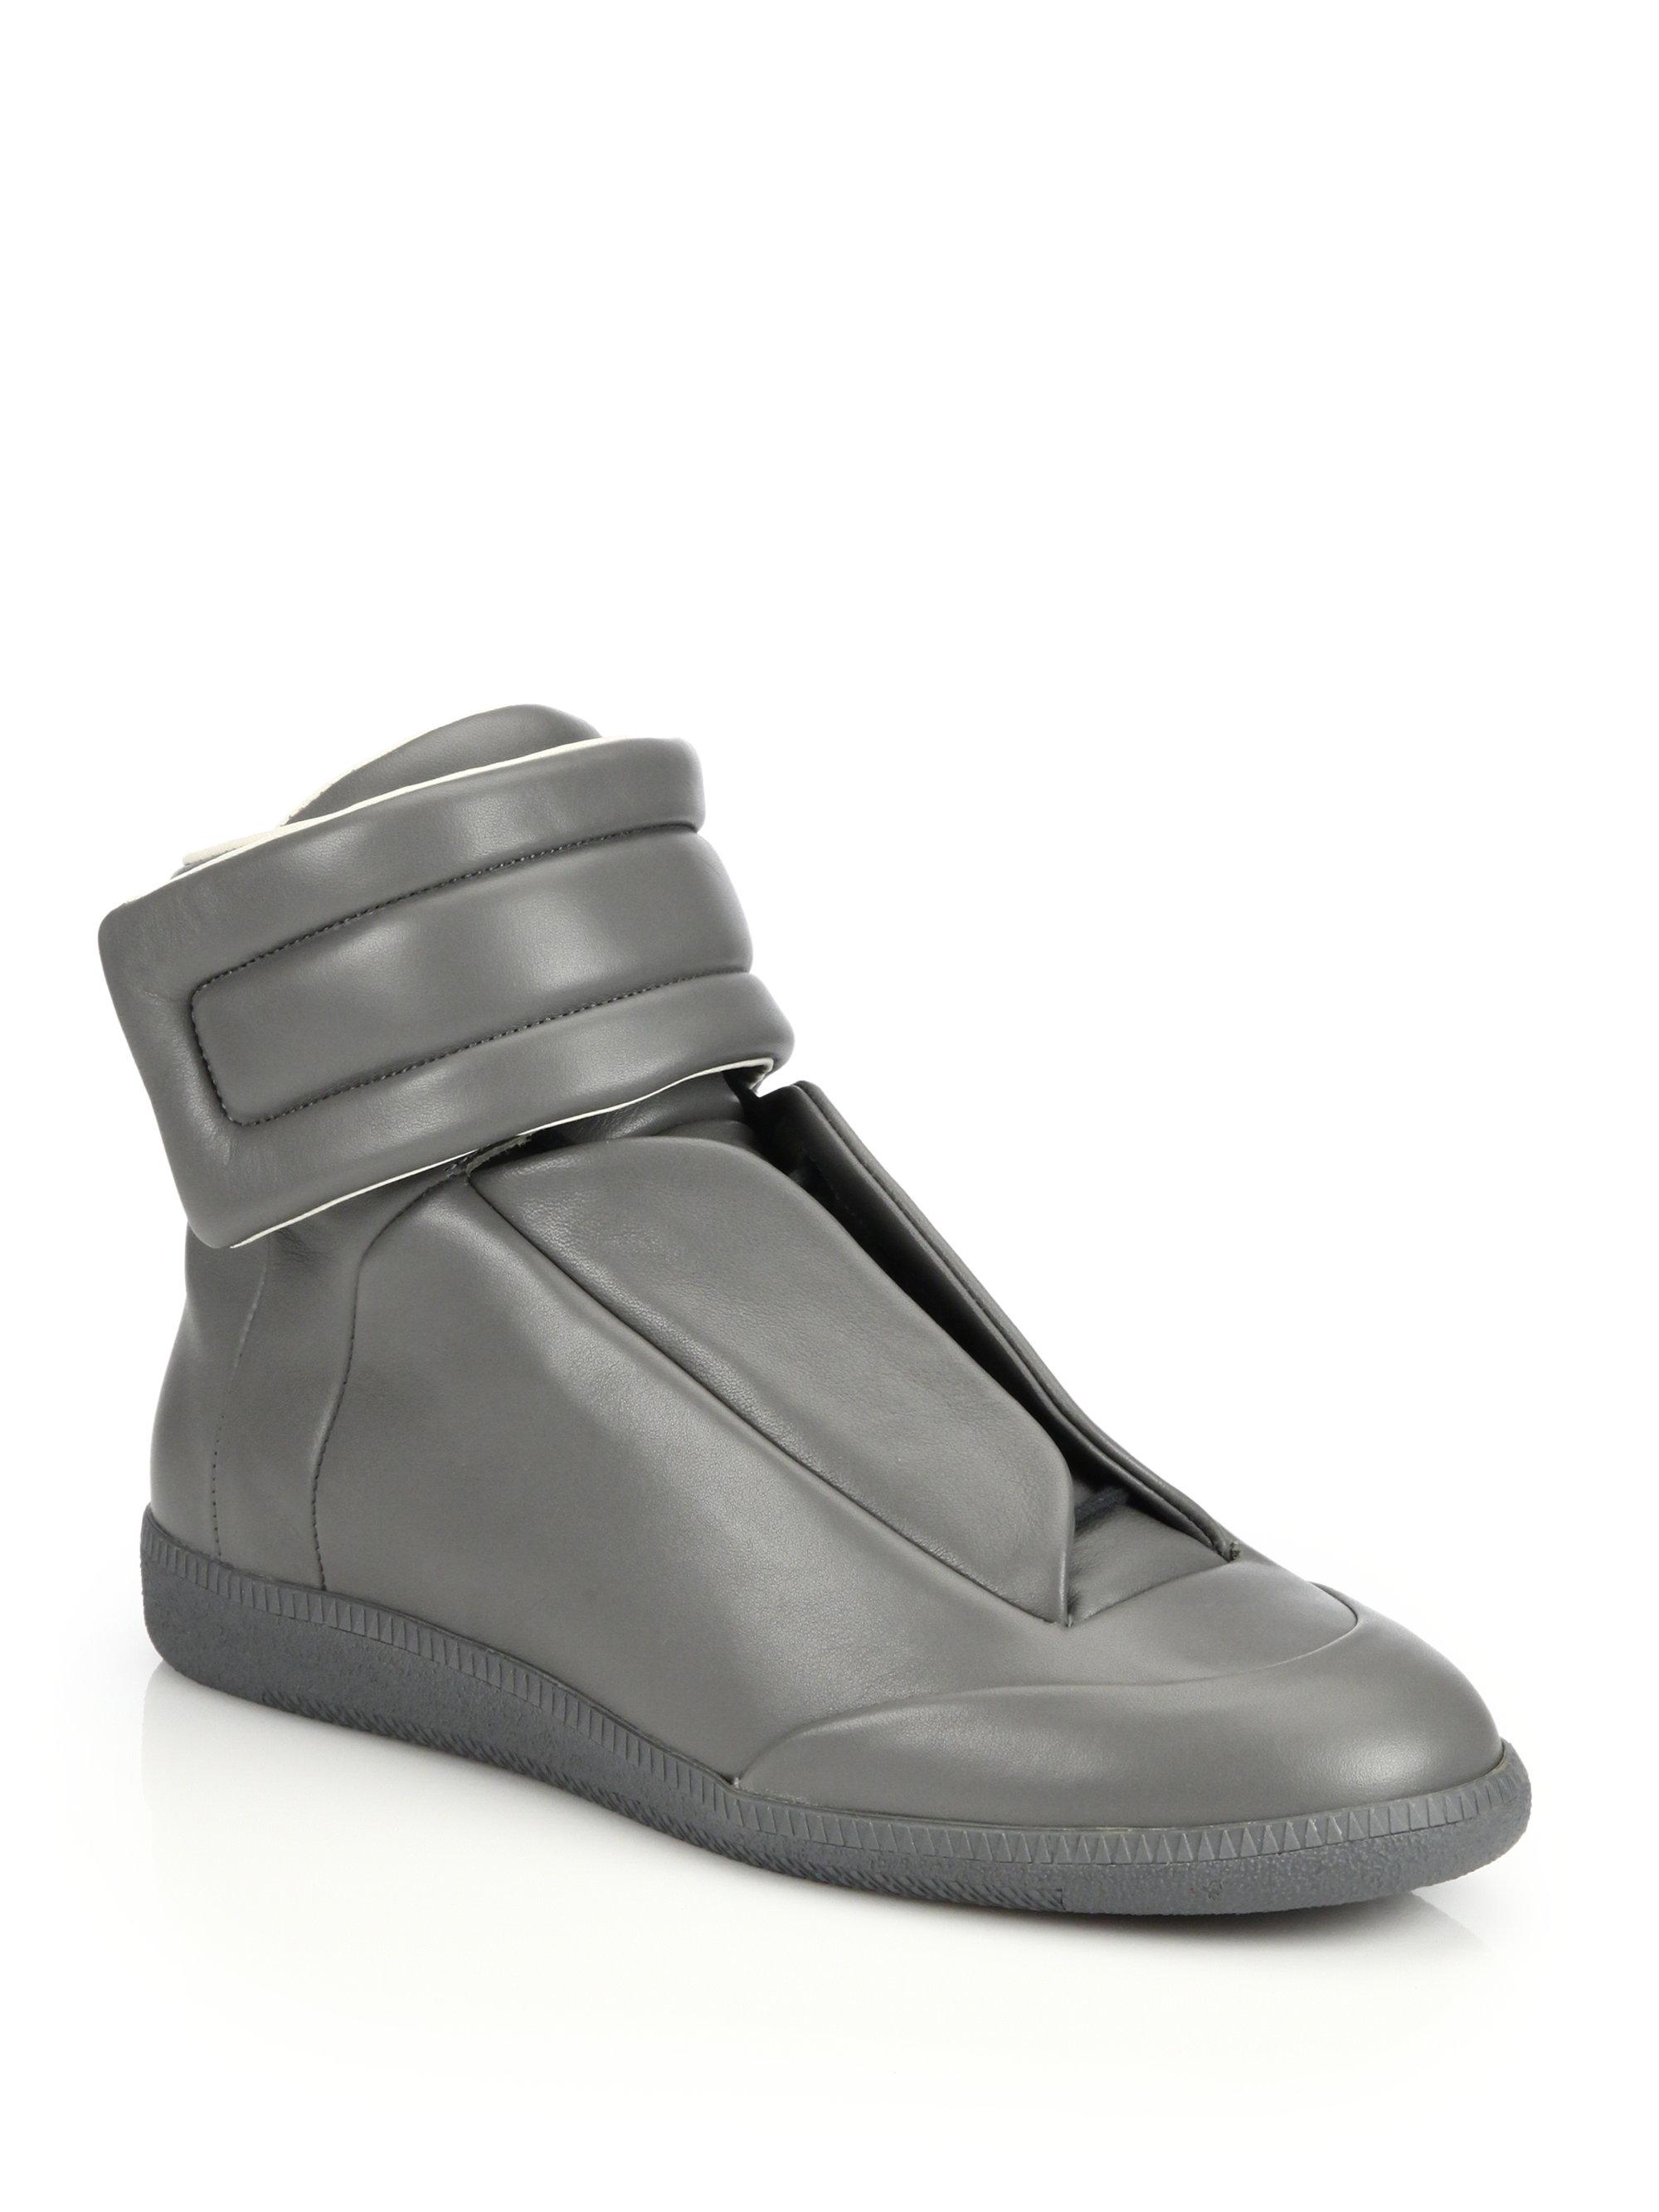 Maison margiela 22 grey leather future hi top sneakers in for Maison margiela 22